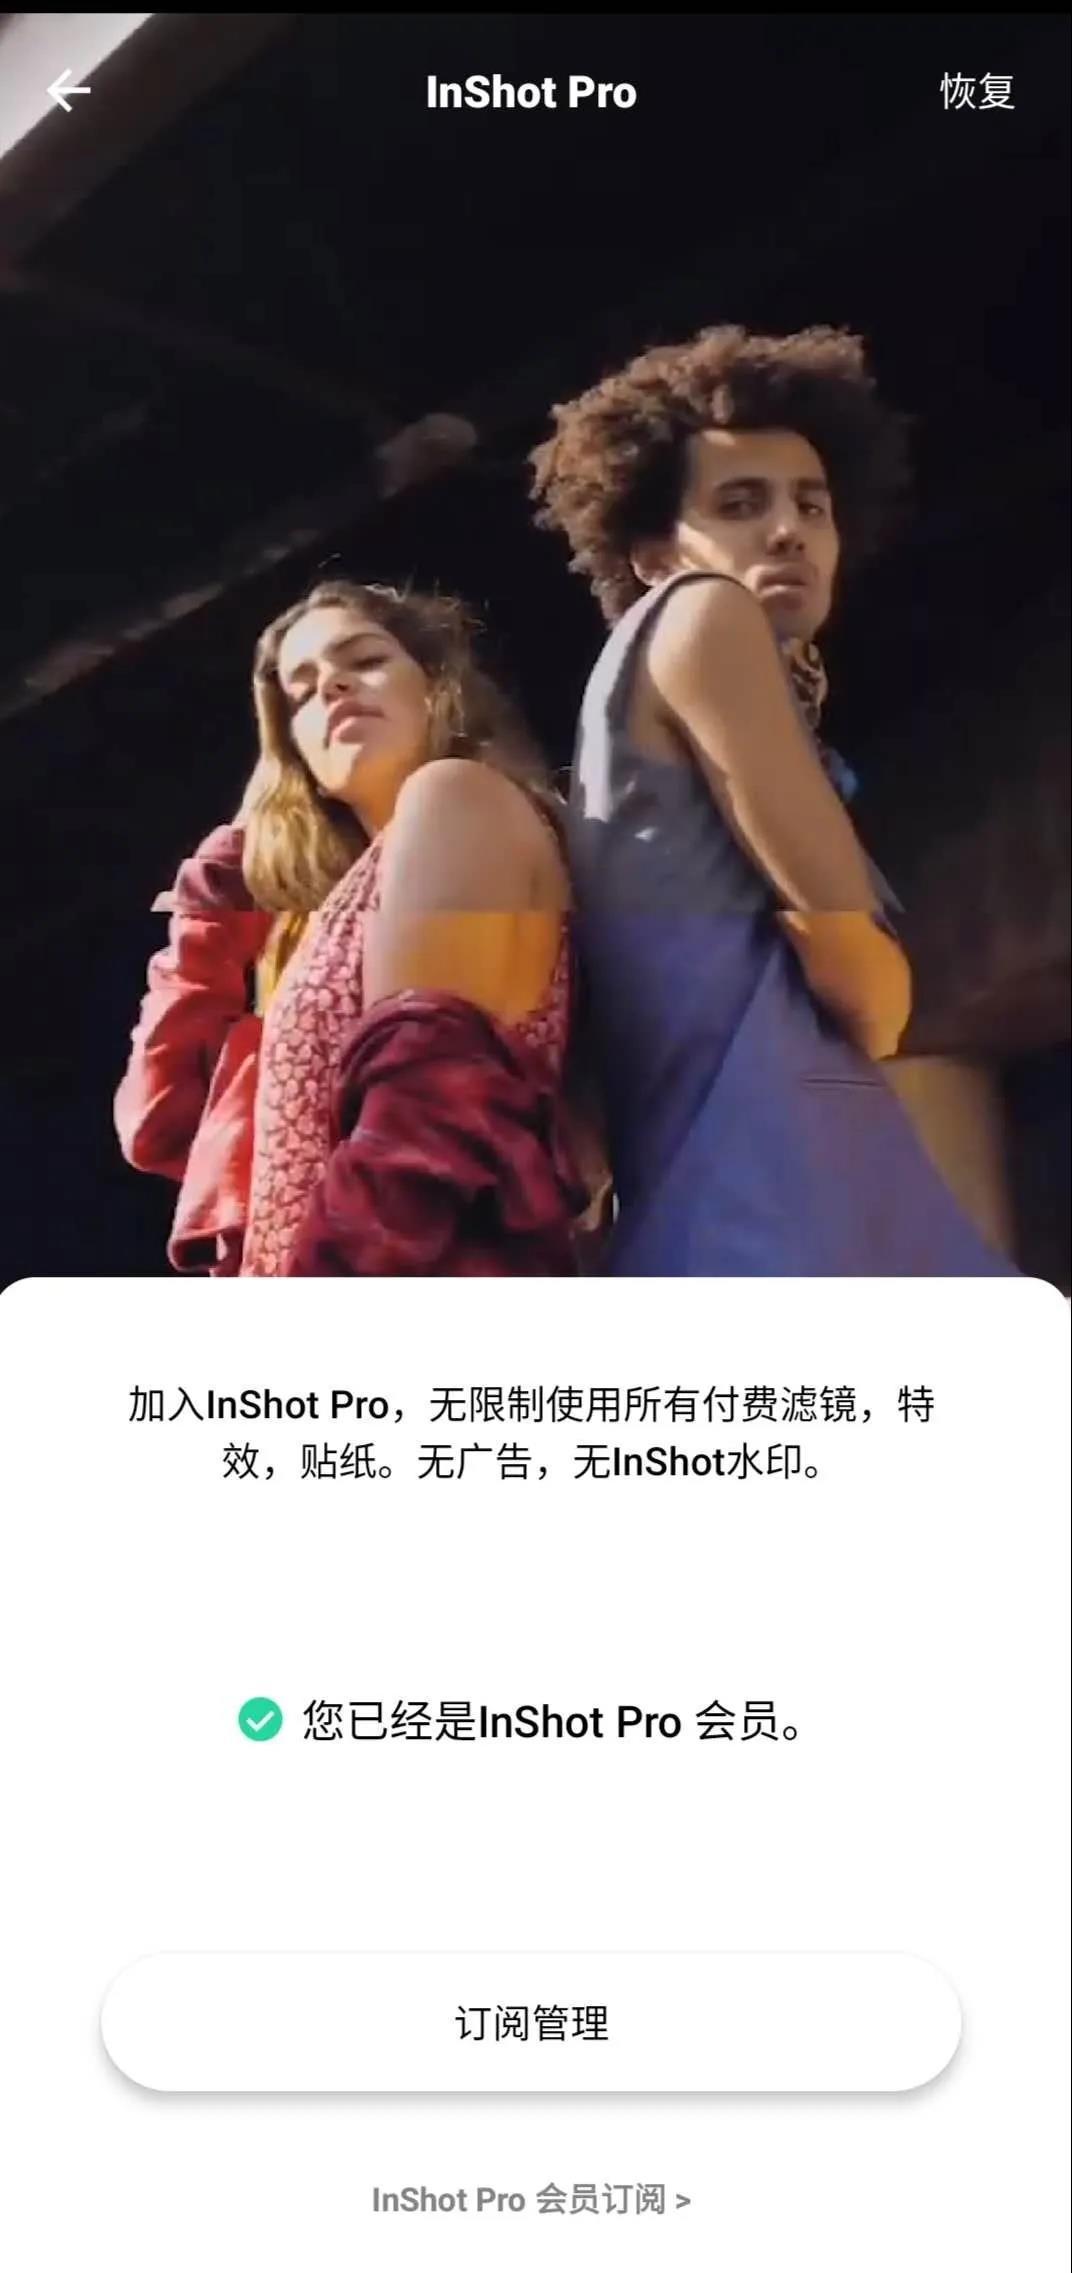 5fa0ae341cd1bbb86ba96163 真正的顶级视频编辑器——InShot Pro